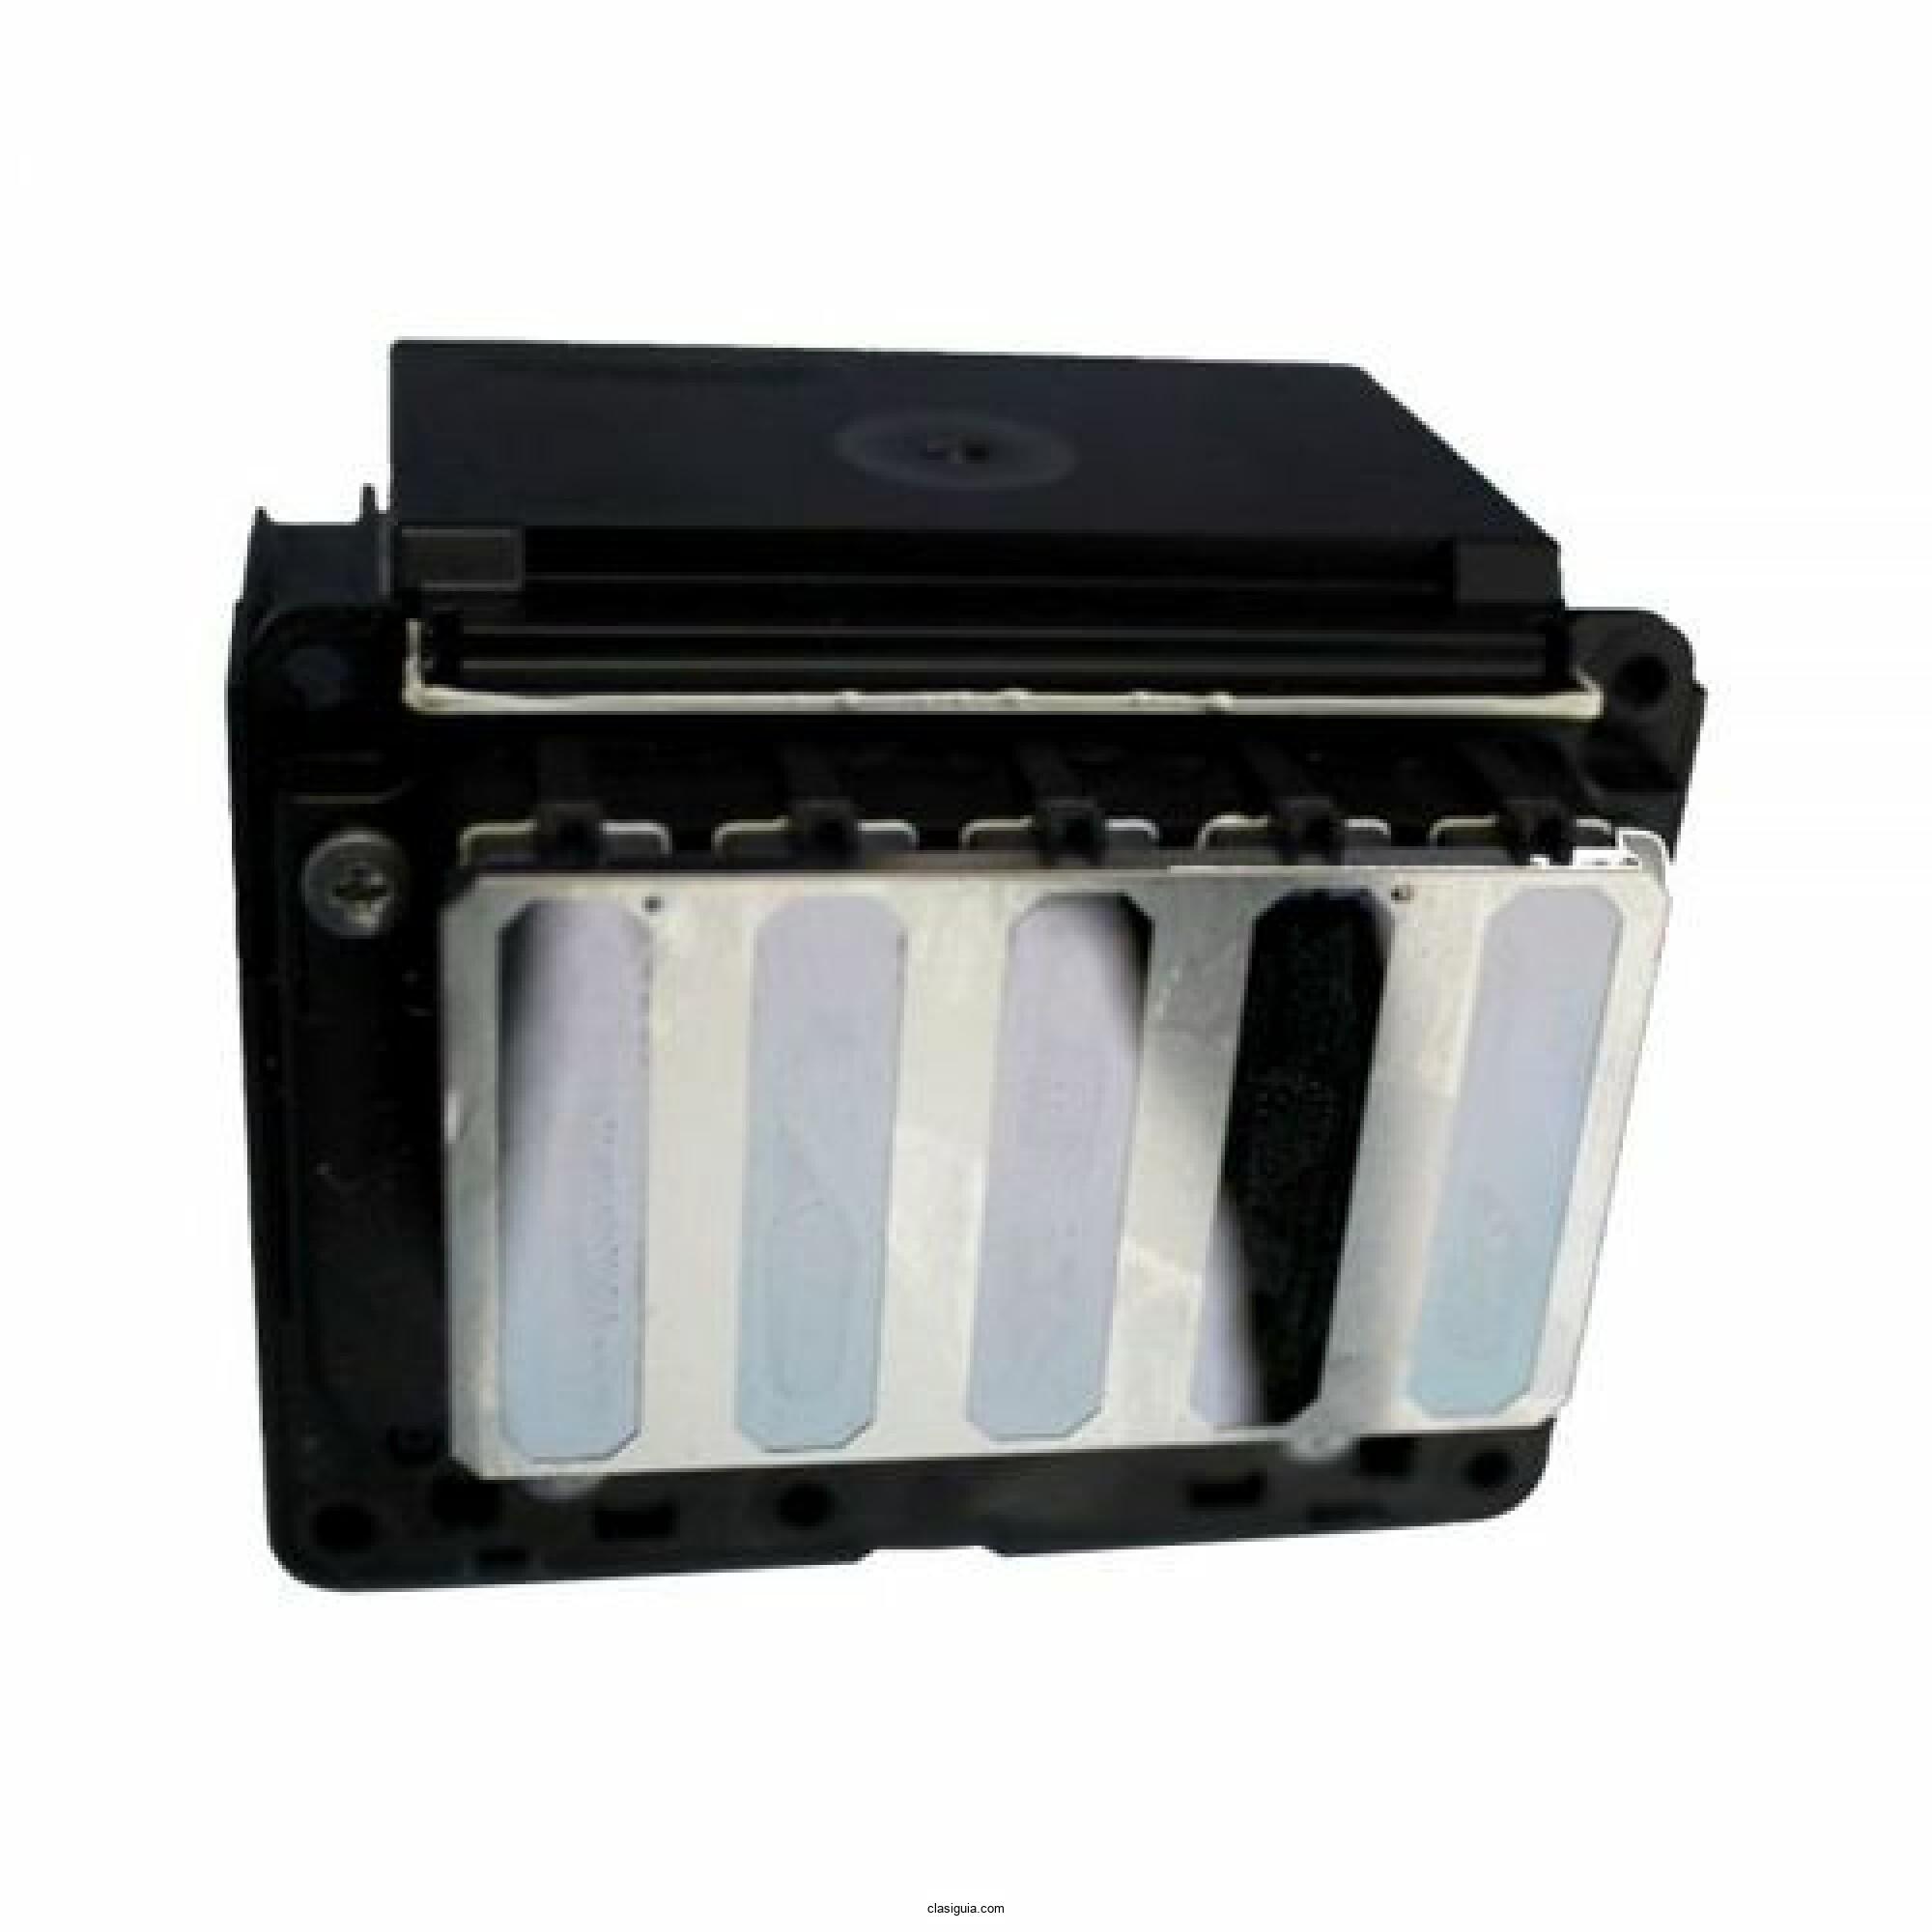 Epson R4900 / R4910 / SPE4910 Printhead - F198000 / F198060 (INDOELECTRONIC)